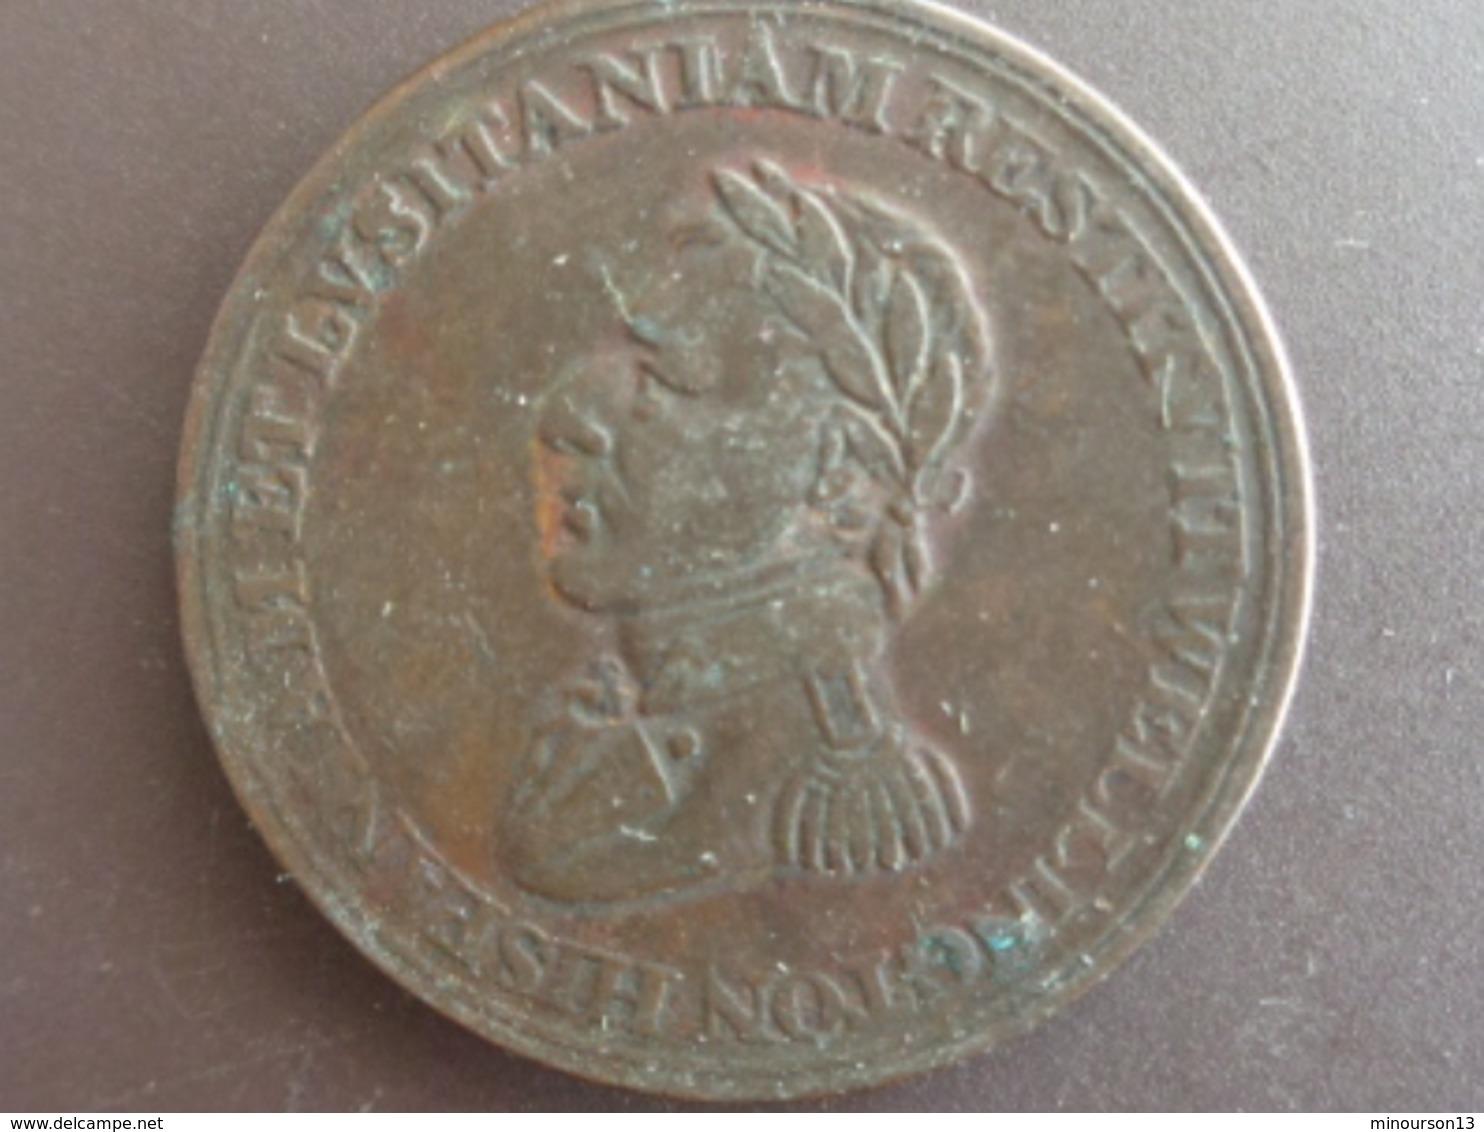 GUIDAD RODRIGO 19 JANVIER 1812 BADAJOZ  2 AVRIL 1812 SALAMANCA 2 JUILLET 1812 - Coins & Banknotes